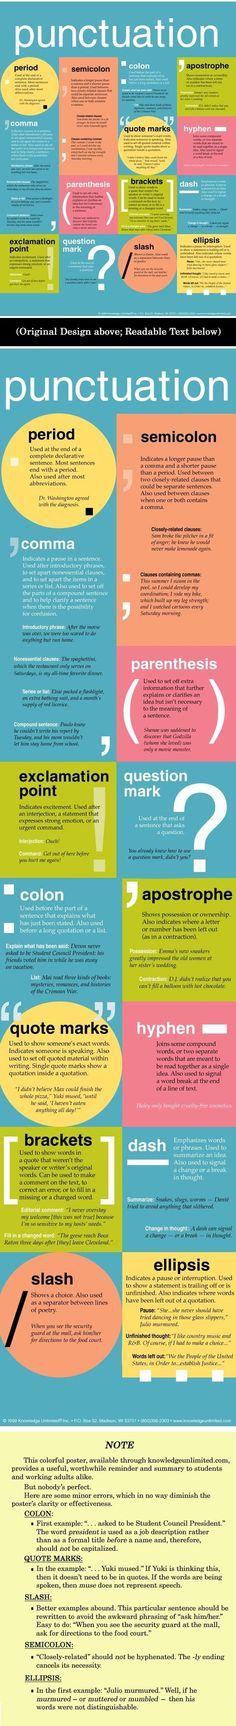 Punctuation in English Teaching Writing, Writing Help, Writing Skills, Essay Writing, Writing Prompts, Writing Tips, Writing Resources, Writing Services, English Writing